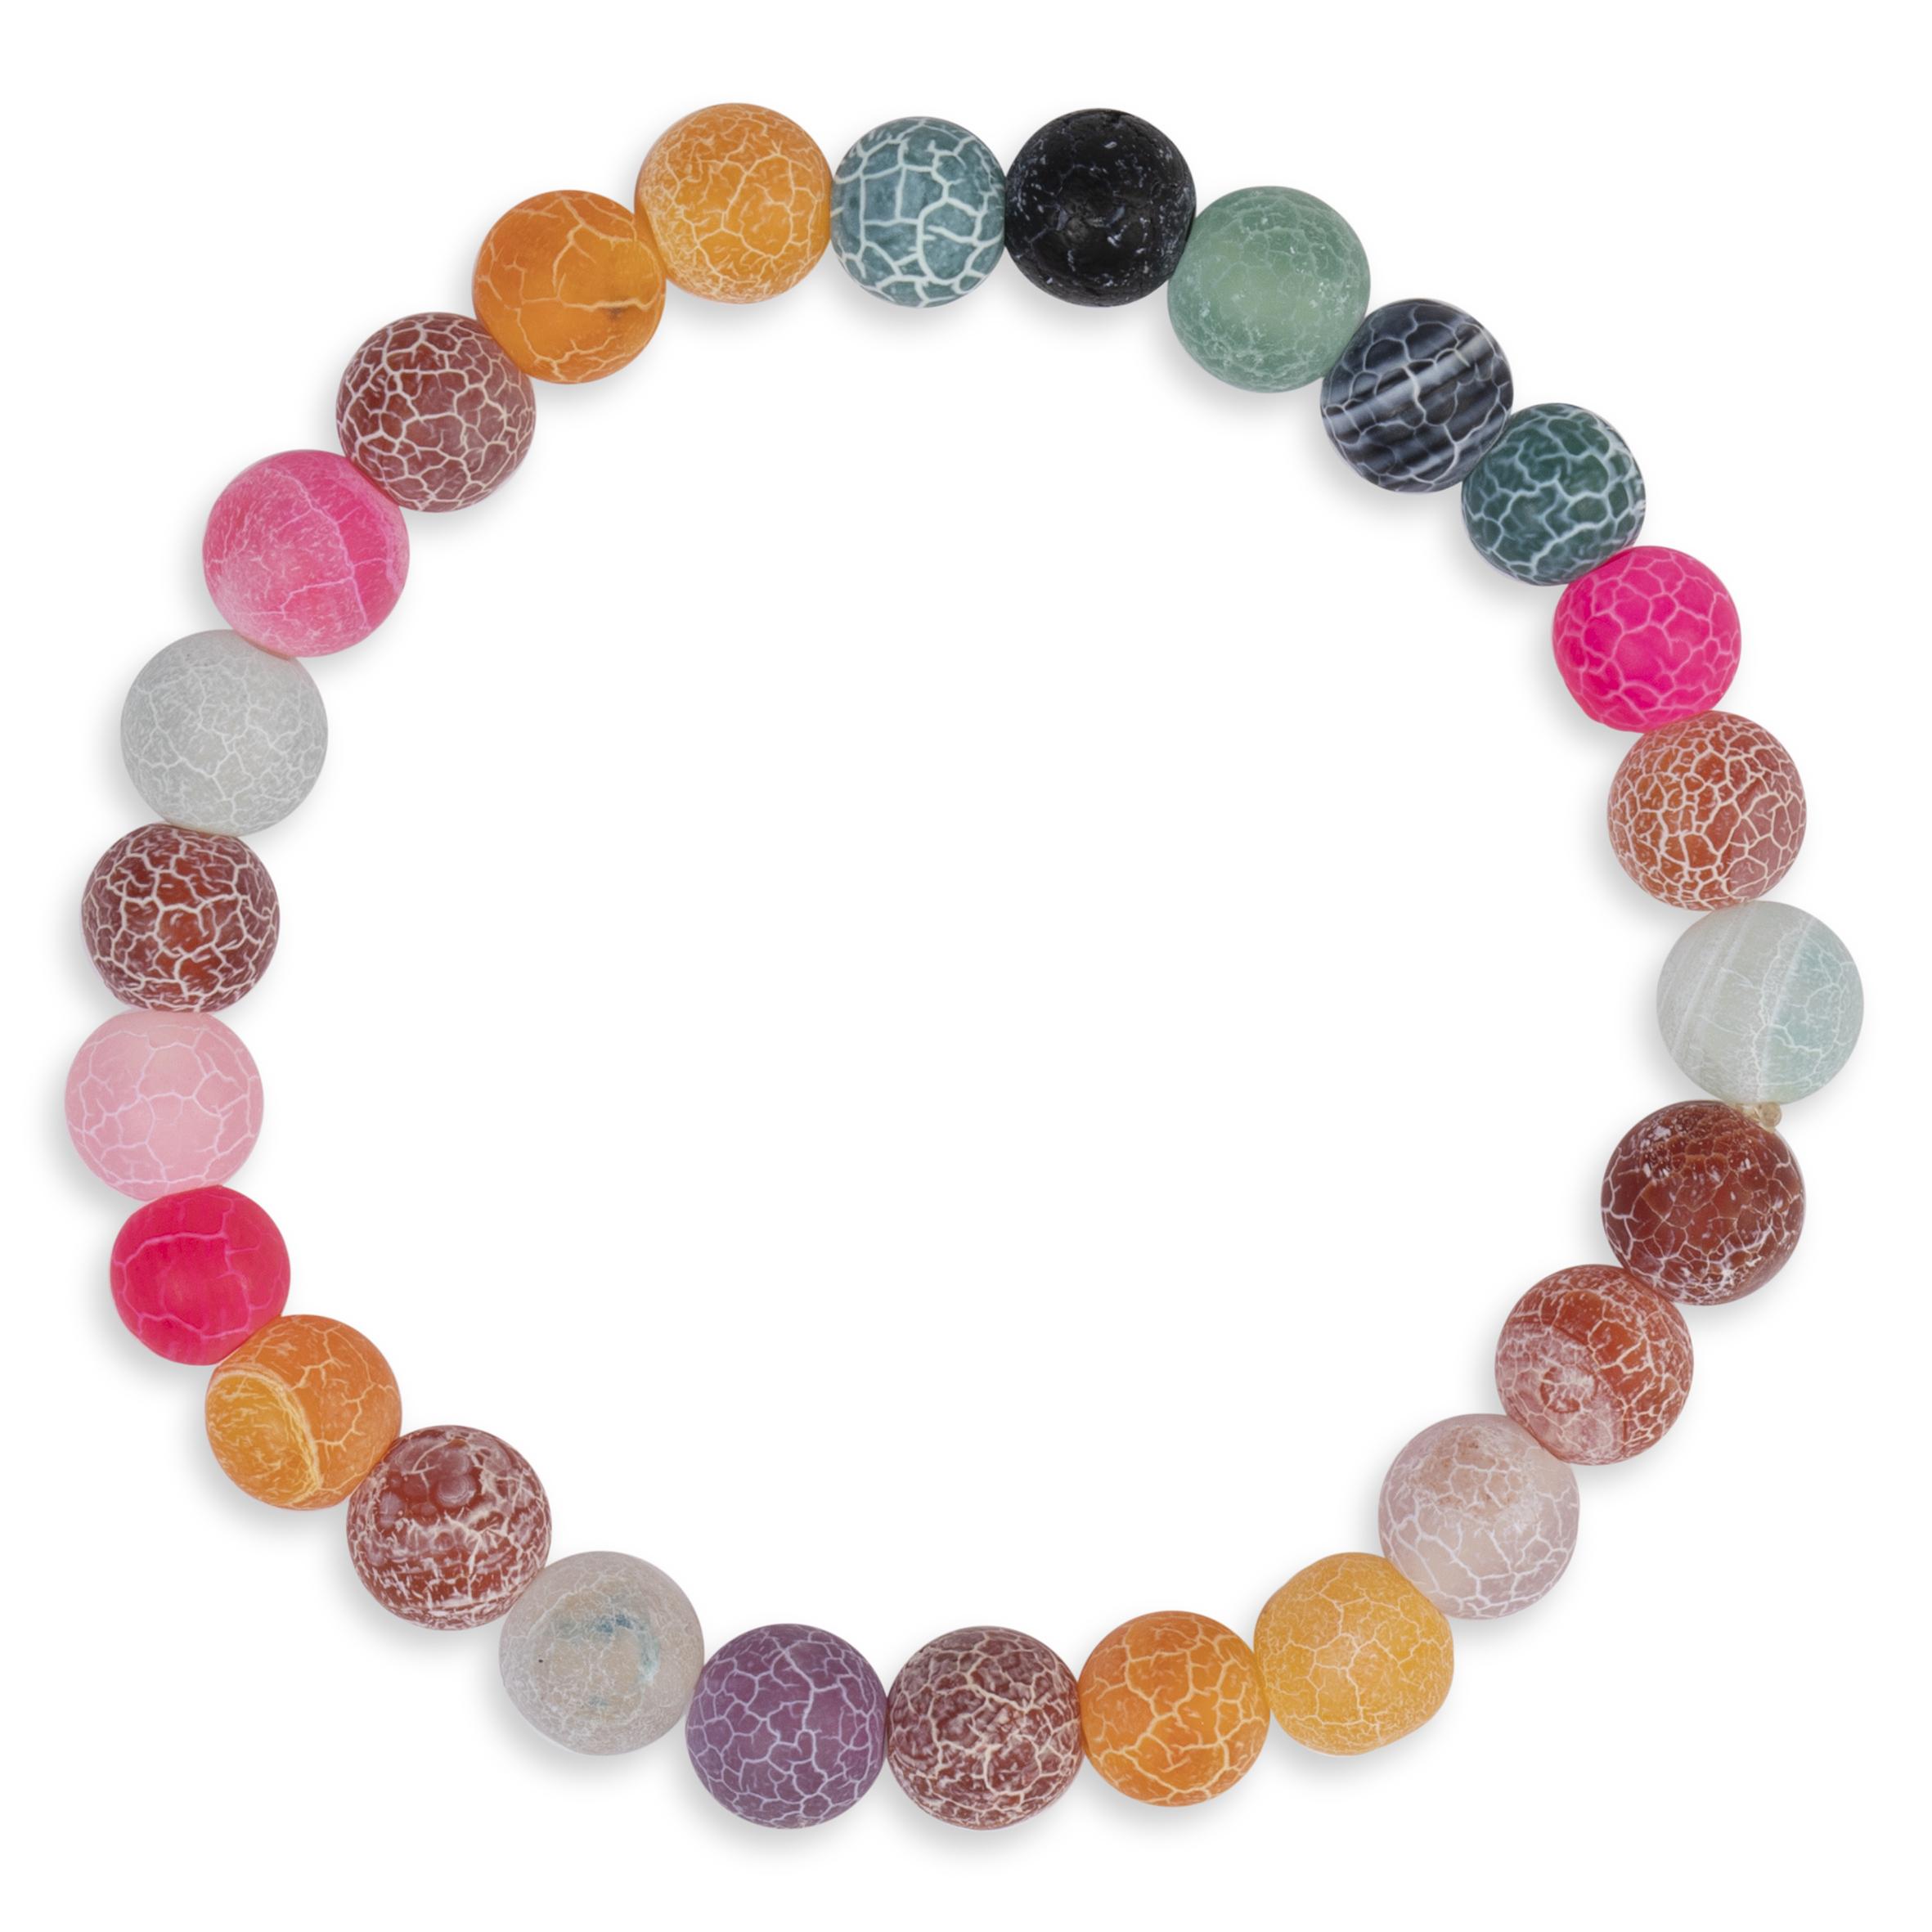 Barnsmycke pfg Stockholm Pearls Kids-Colorfull Agathe Bracelet 11010-12